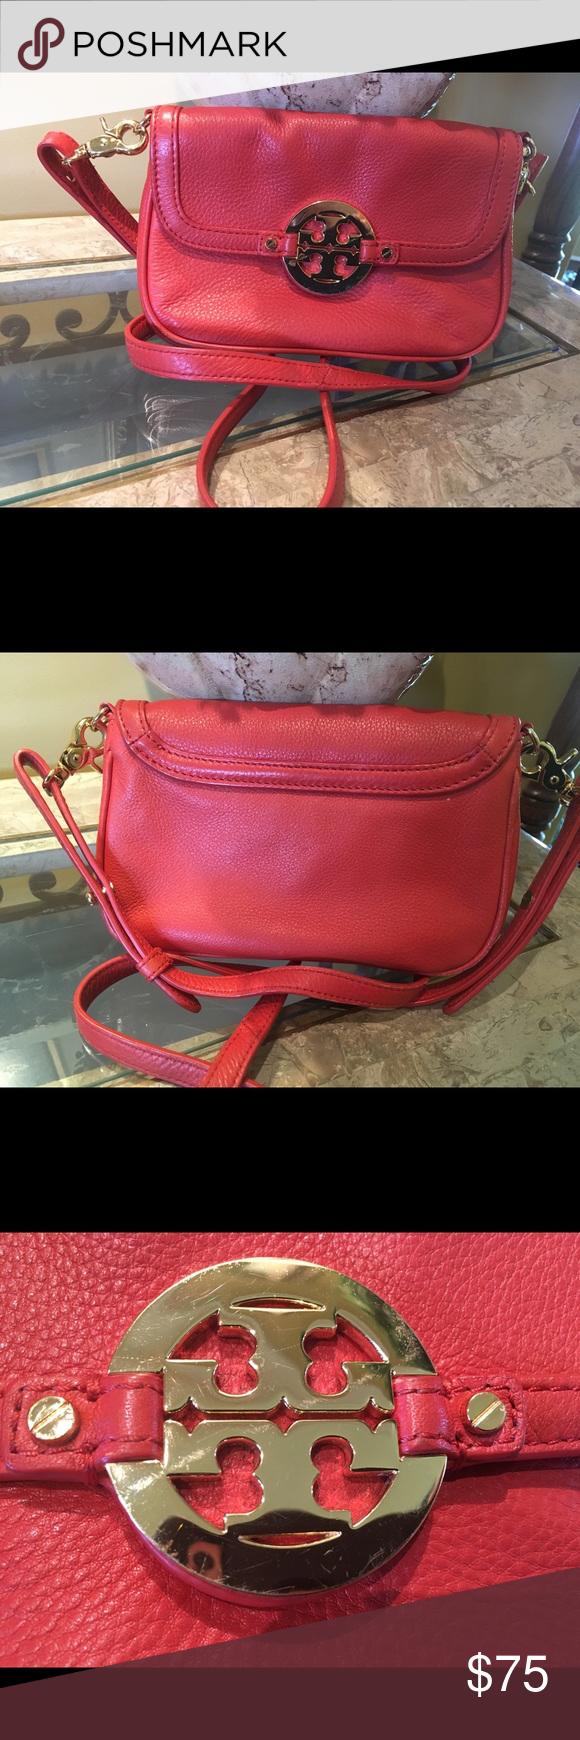 6e9f9da303e Tory Burch Orange Leather Crossbody Purse! Authentic Tory Burch orange  leather Crossbody purse. Preowned